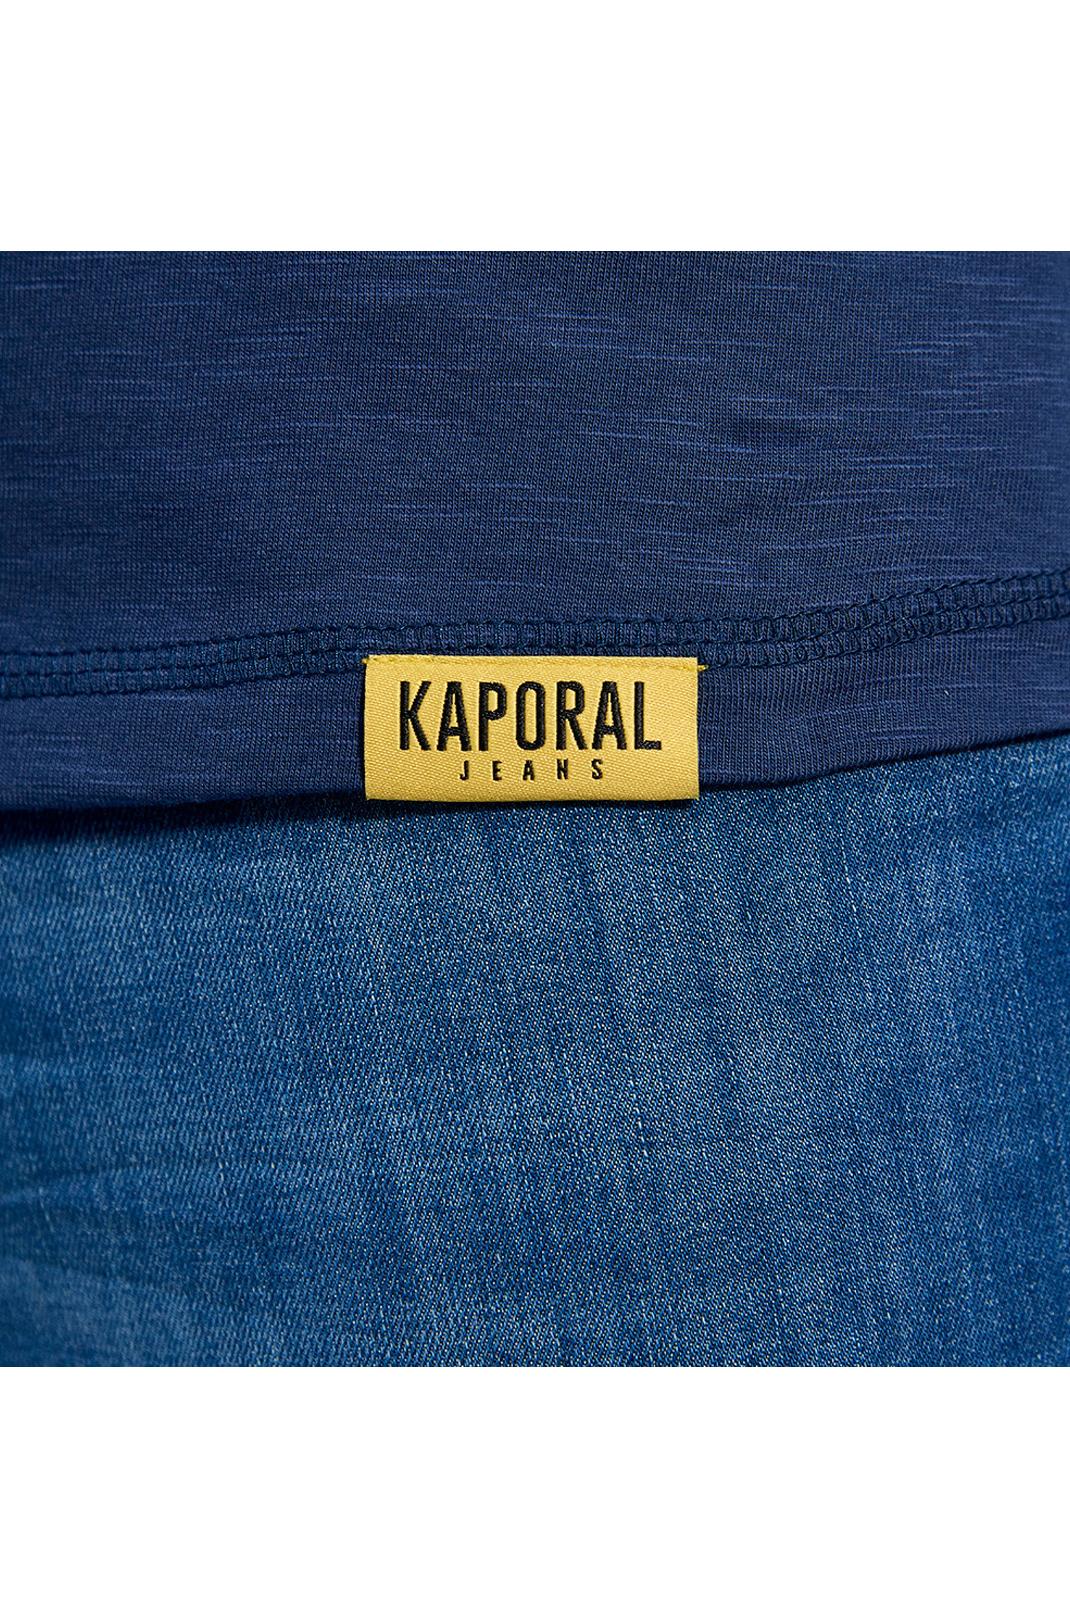 T-S manches courtes  Kaporal TORZO BLUEUS